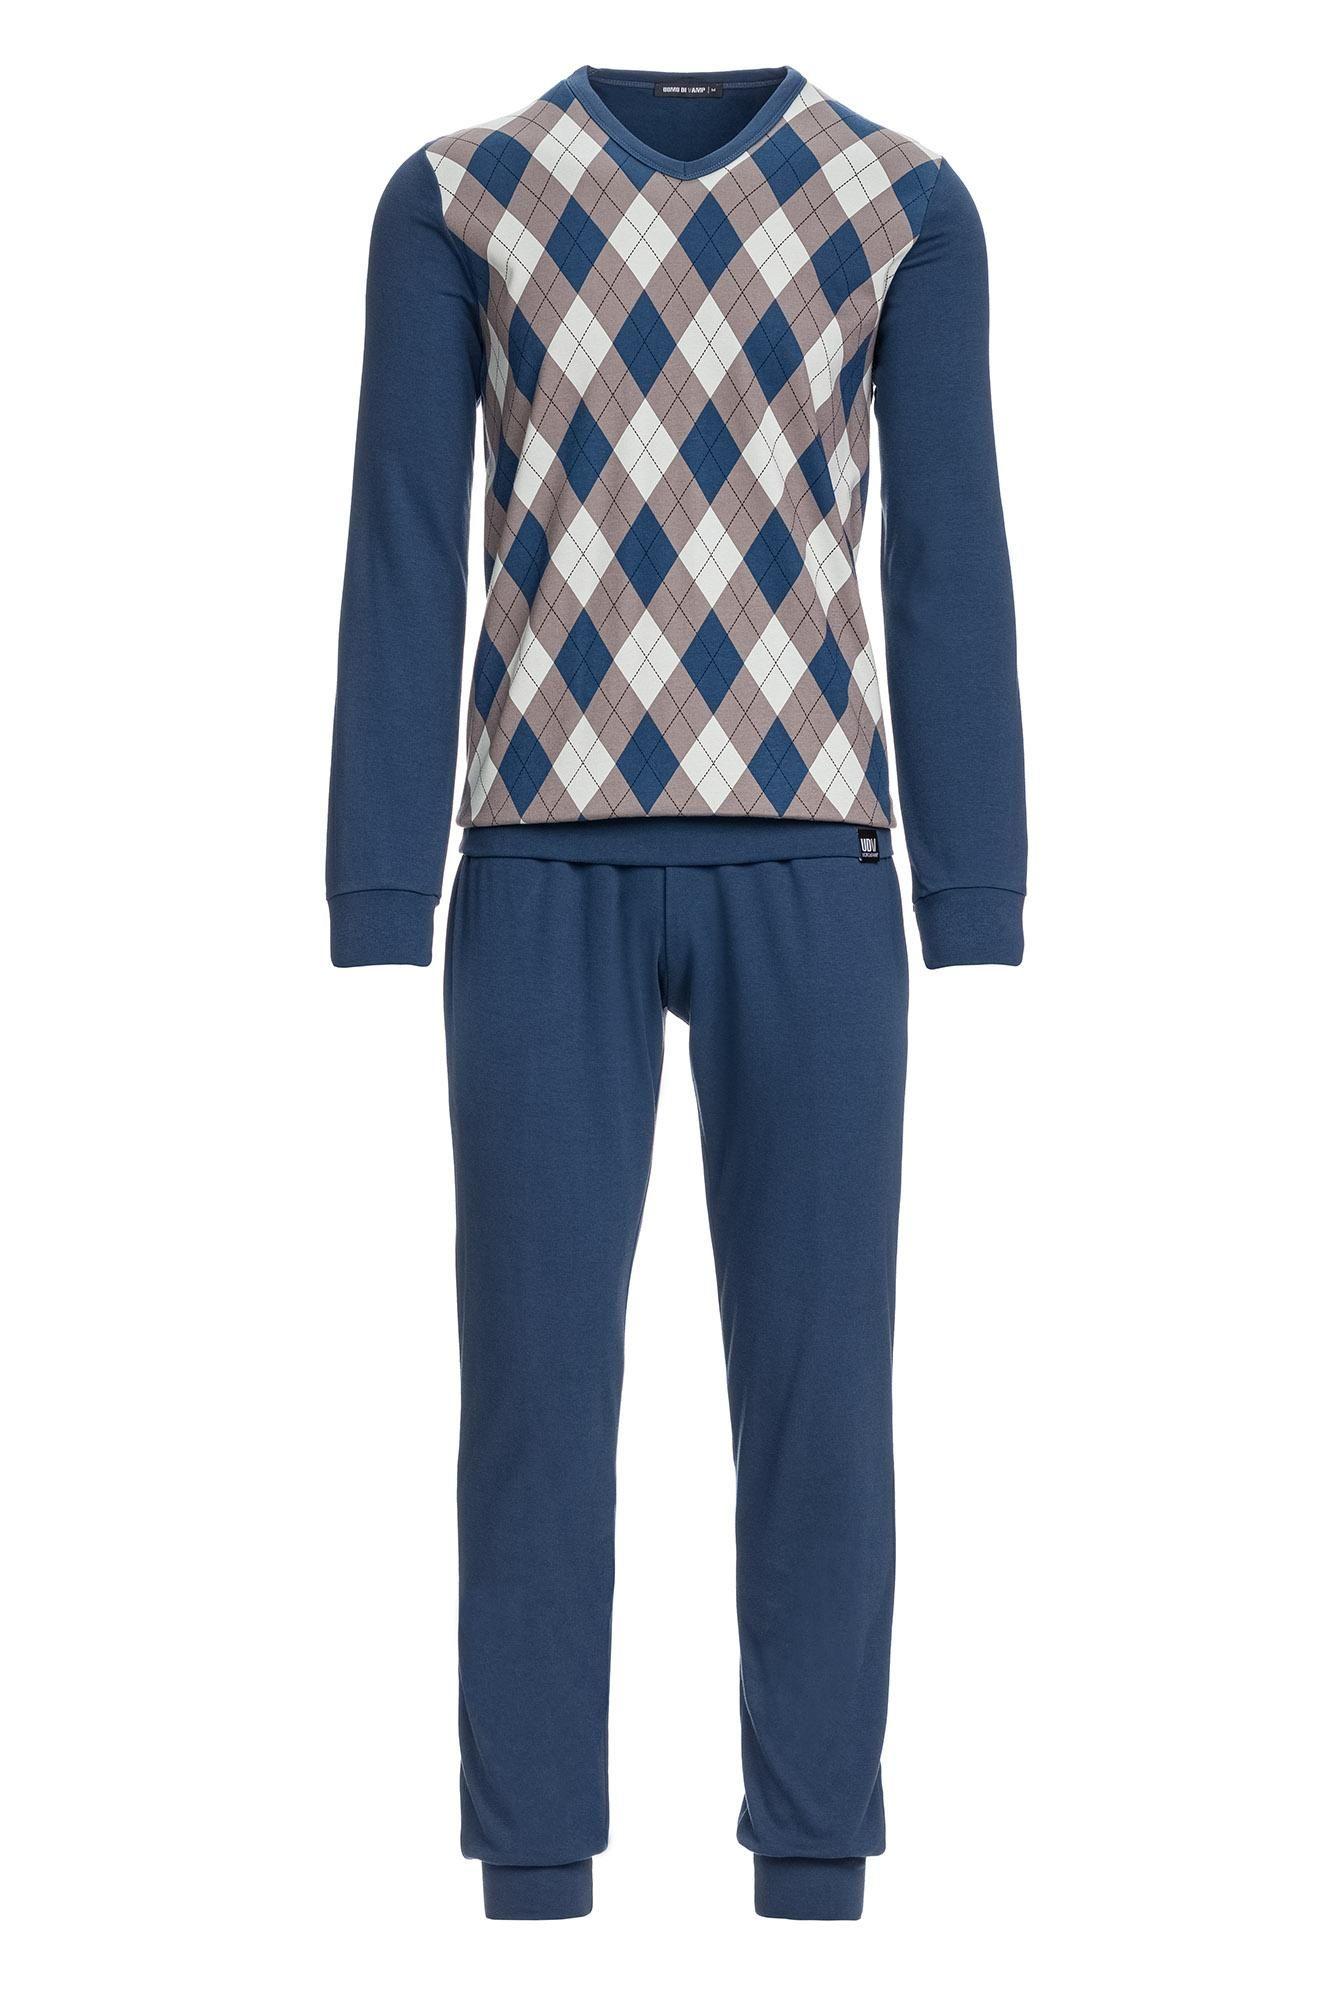 Men's Plaid Pyjamas